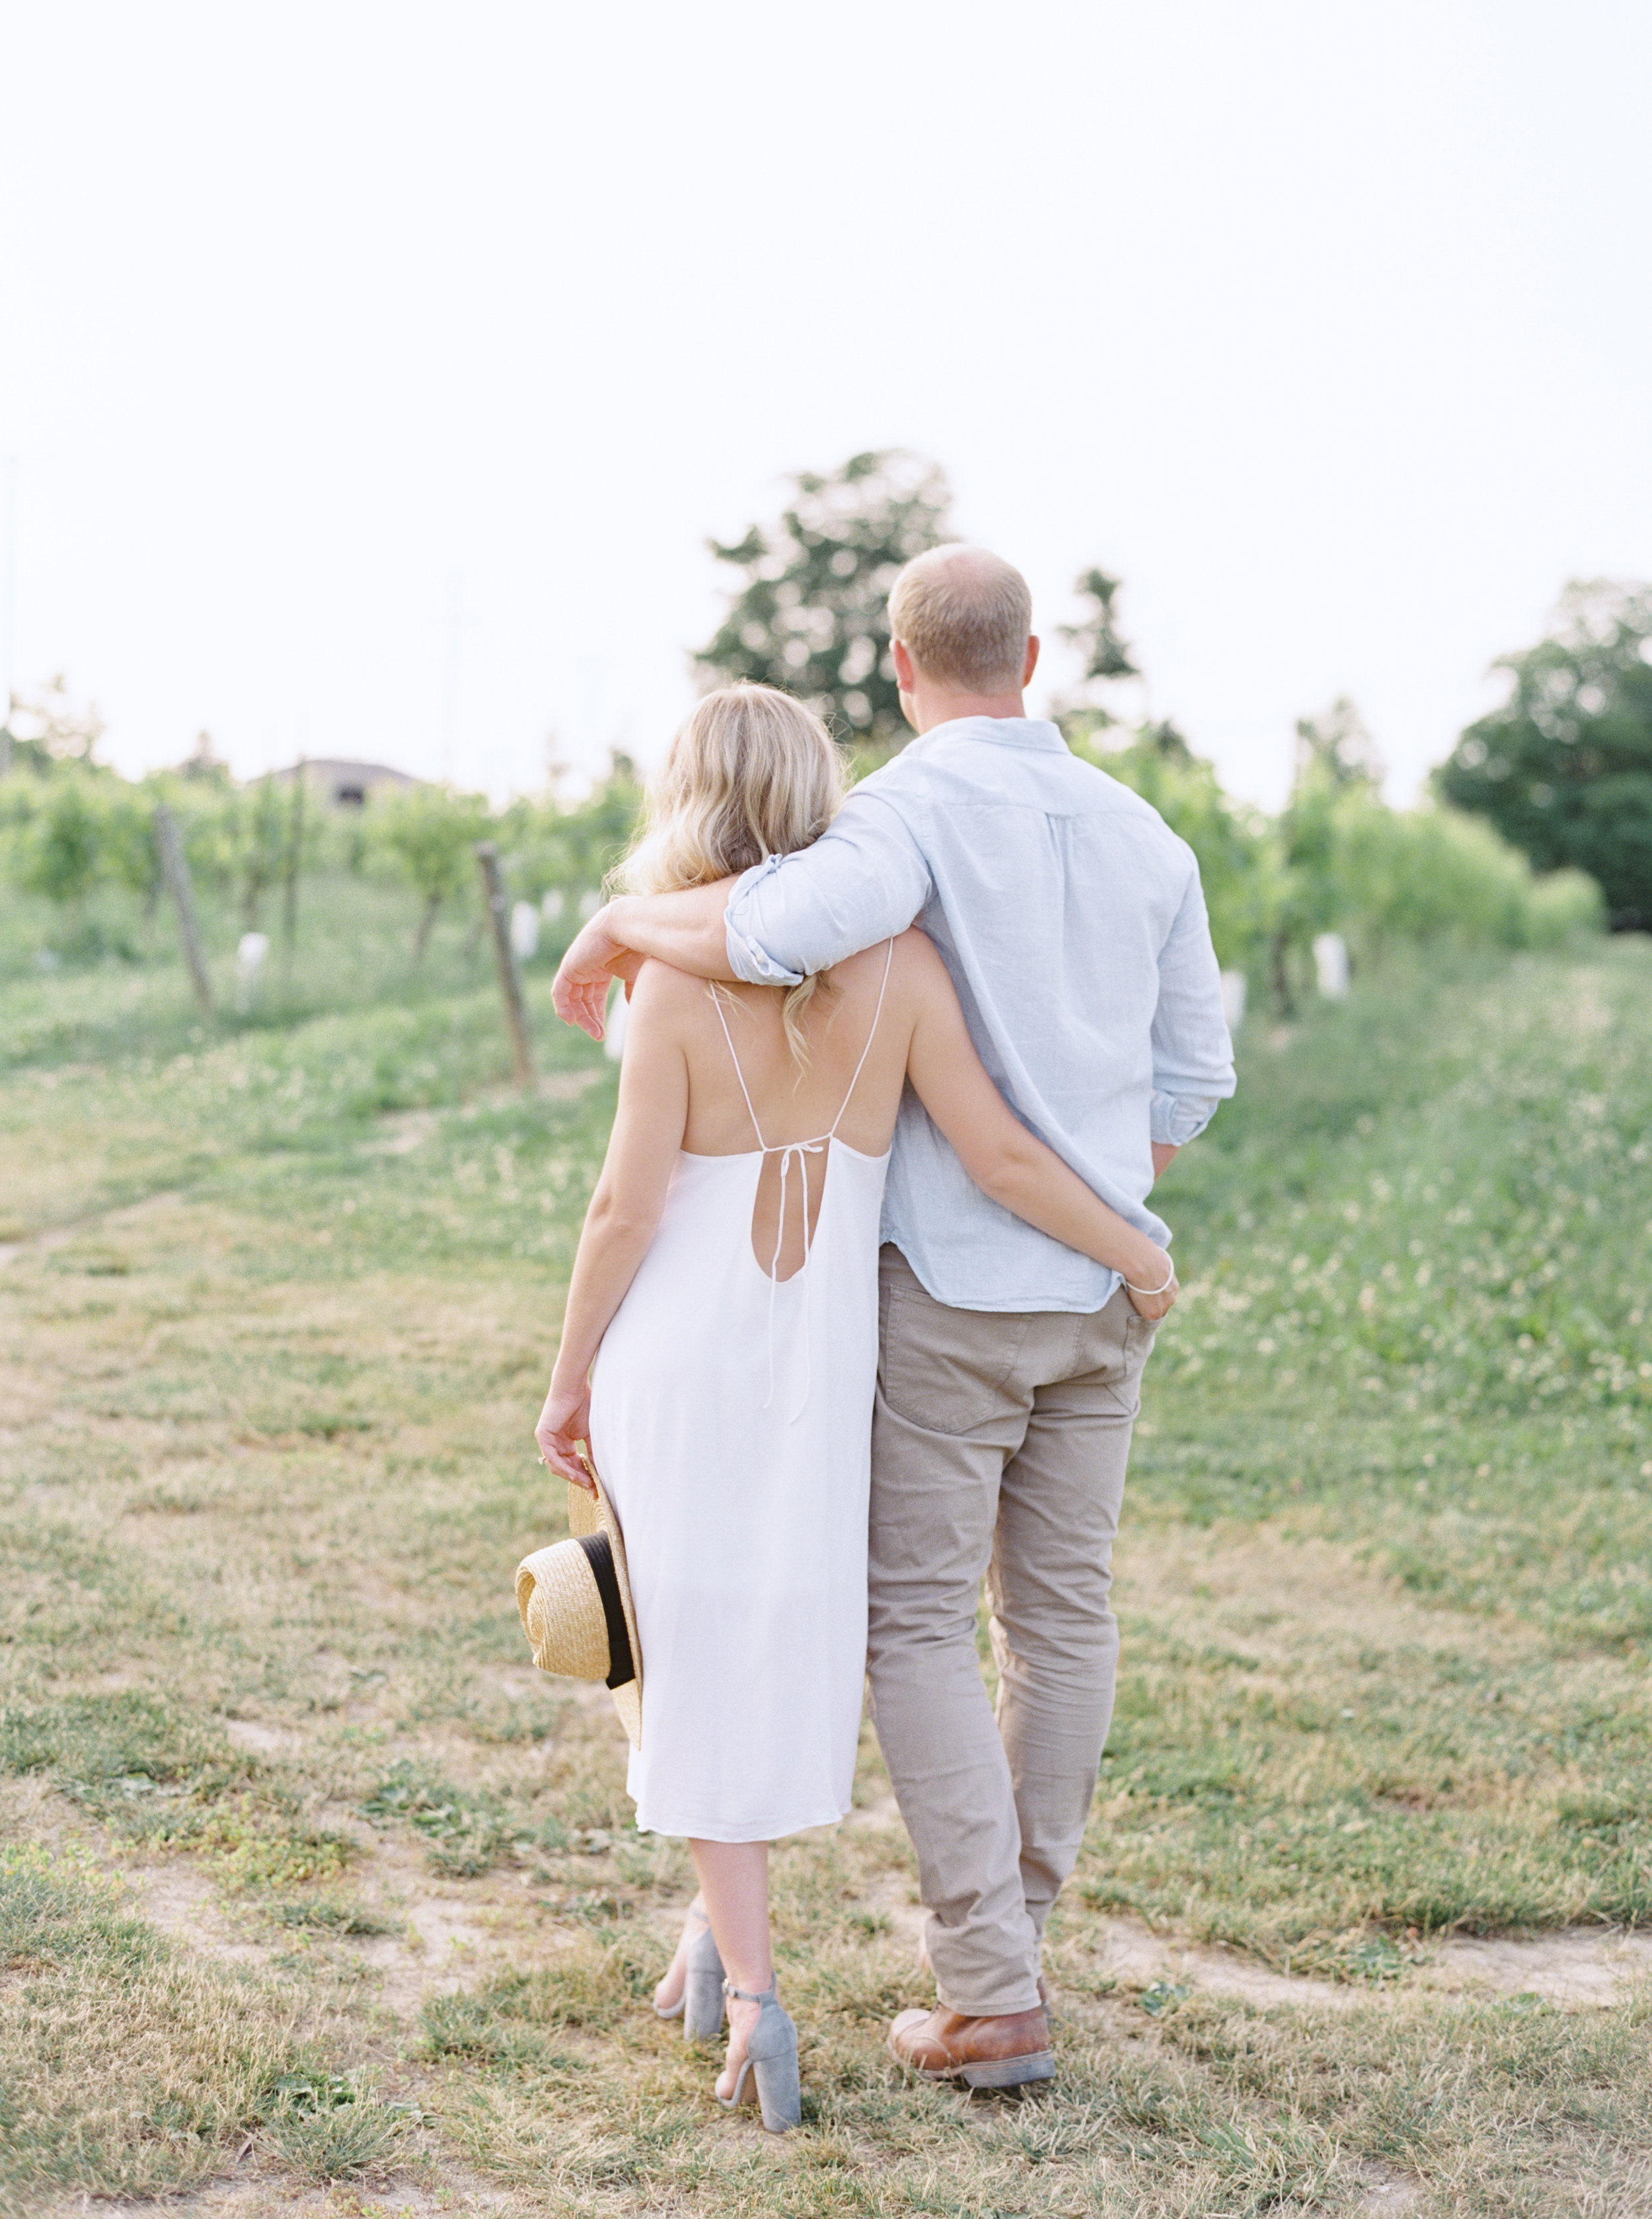 muskoka-best-toronto-wedding-photographer-langdon-hall-kurtz-soft-airy-kacie-parker-220.jpg